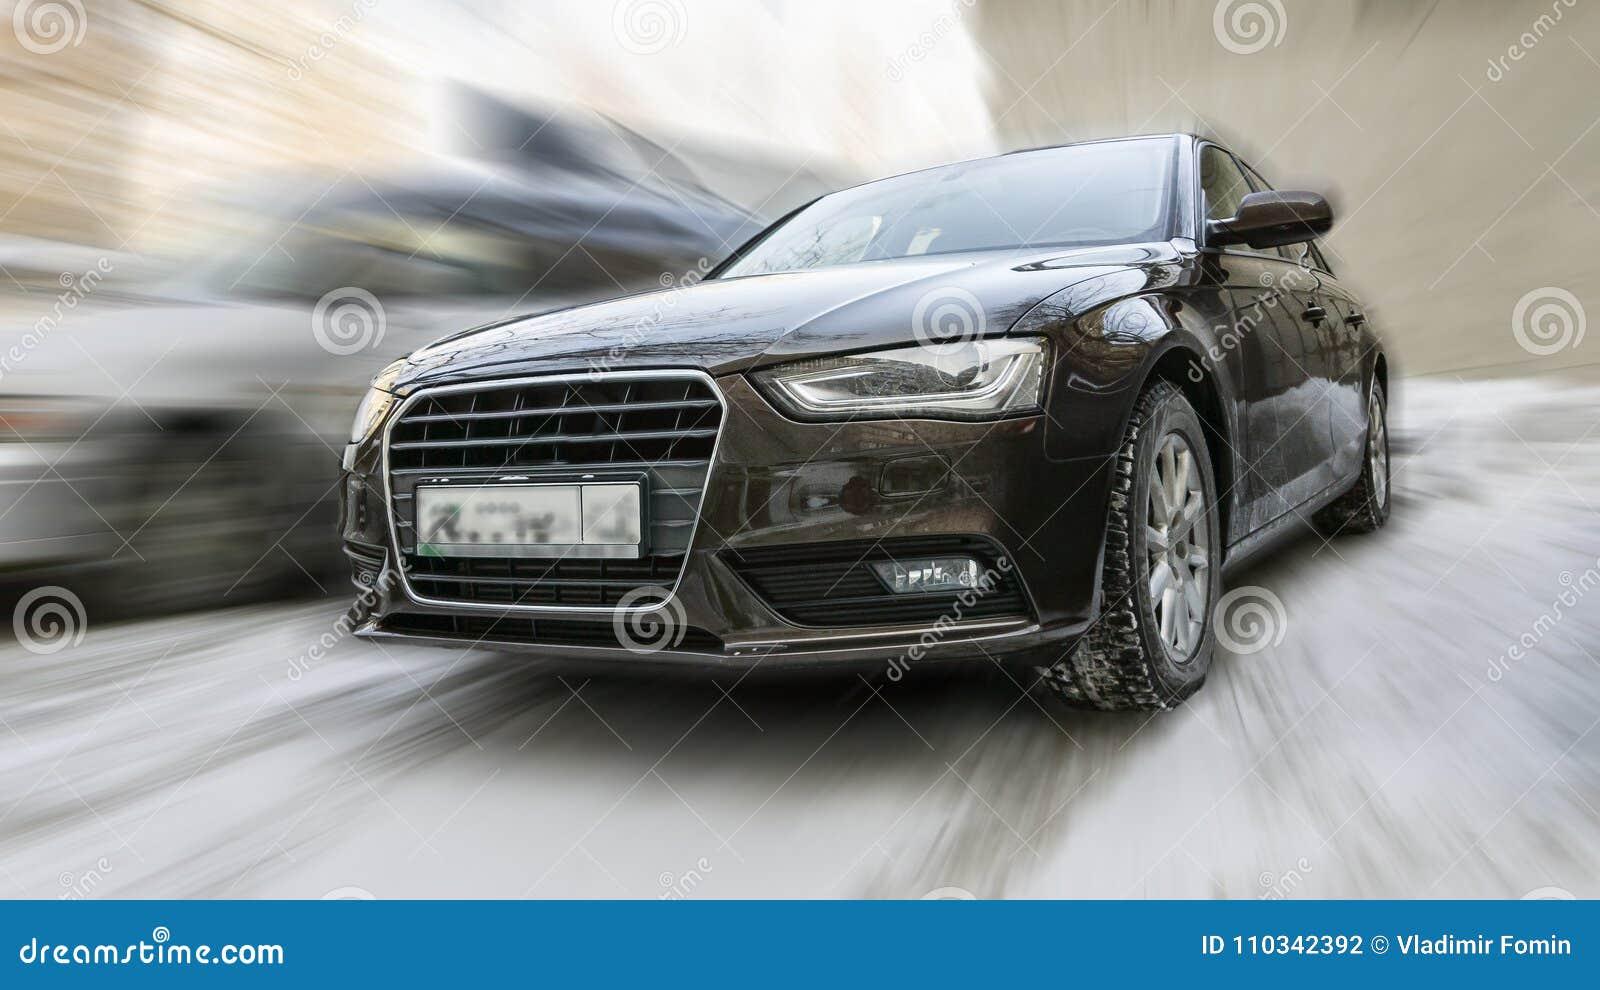 Audi car.